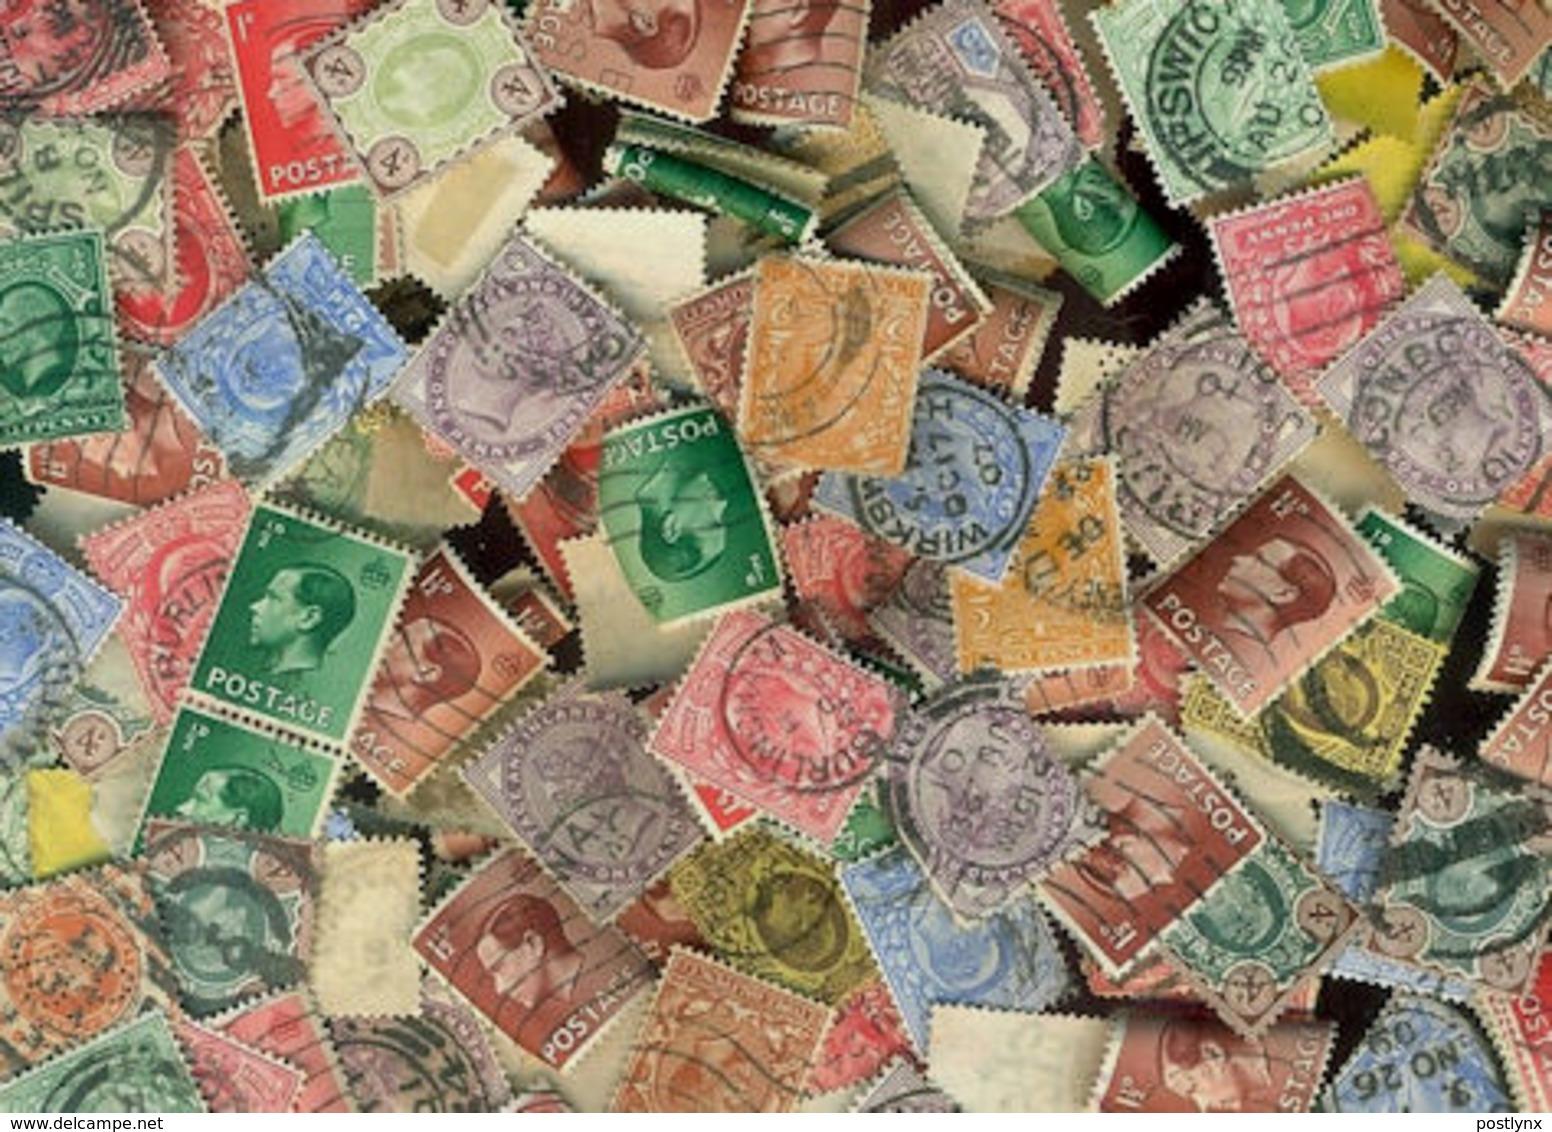 BID Great Britain KILOWARE Pre-QII LazyBag OFF PAPER 200g (7oz) Ca 2.200 Stamps GB - Timbres